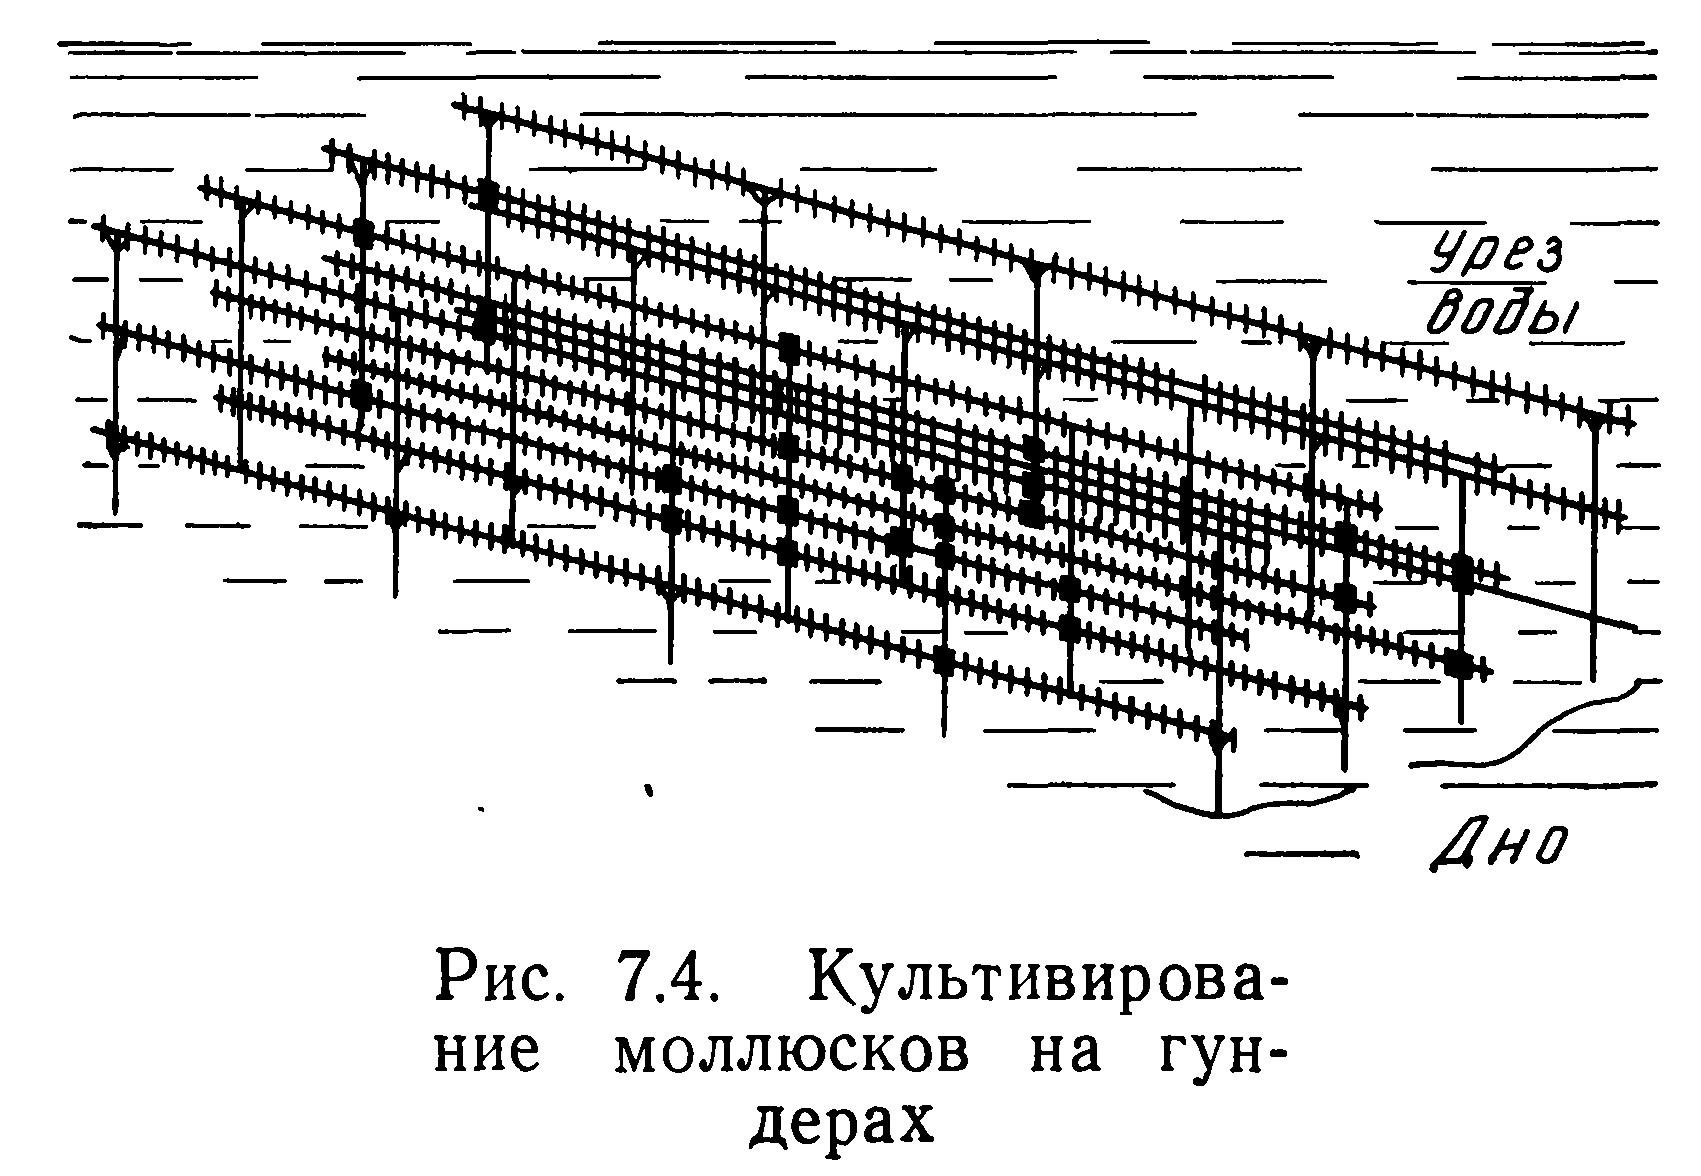 Рис. 7.4. Культивирование моллюсков на гундерах